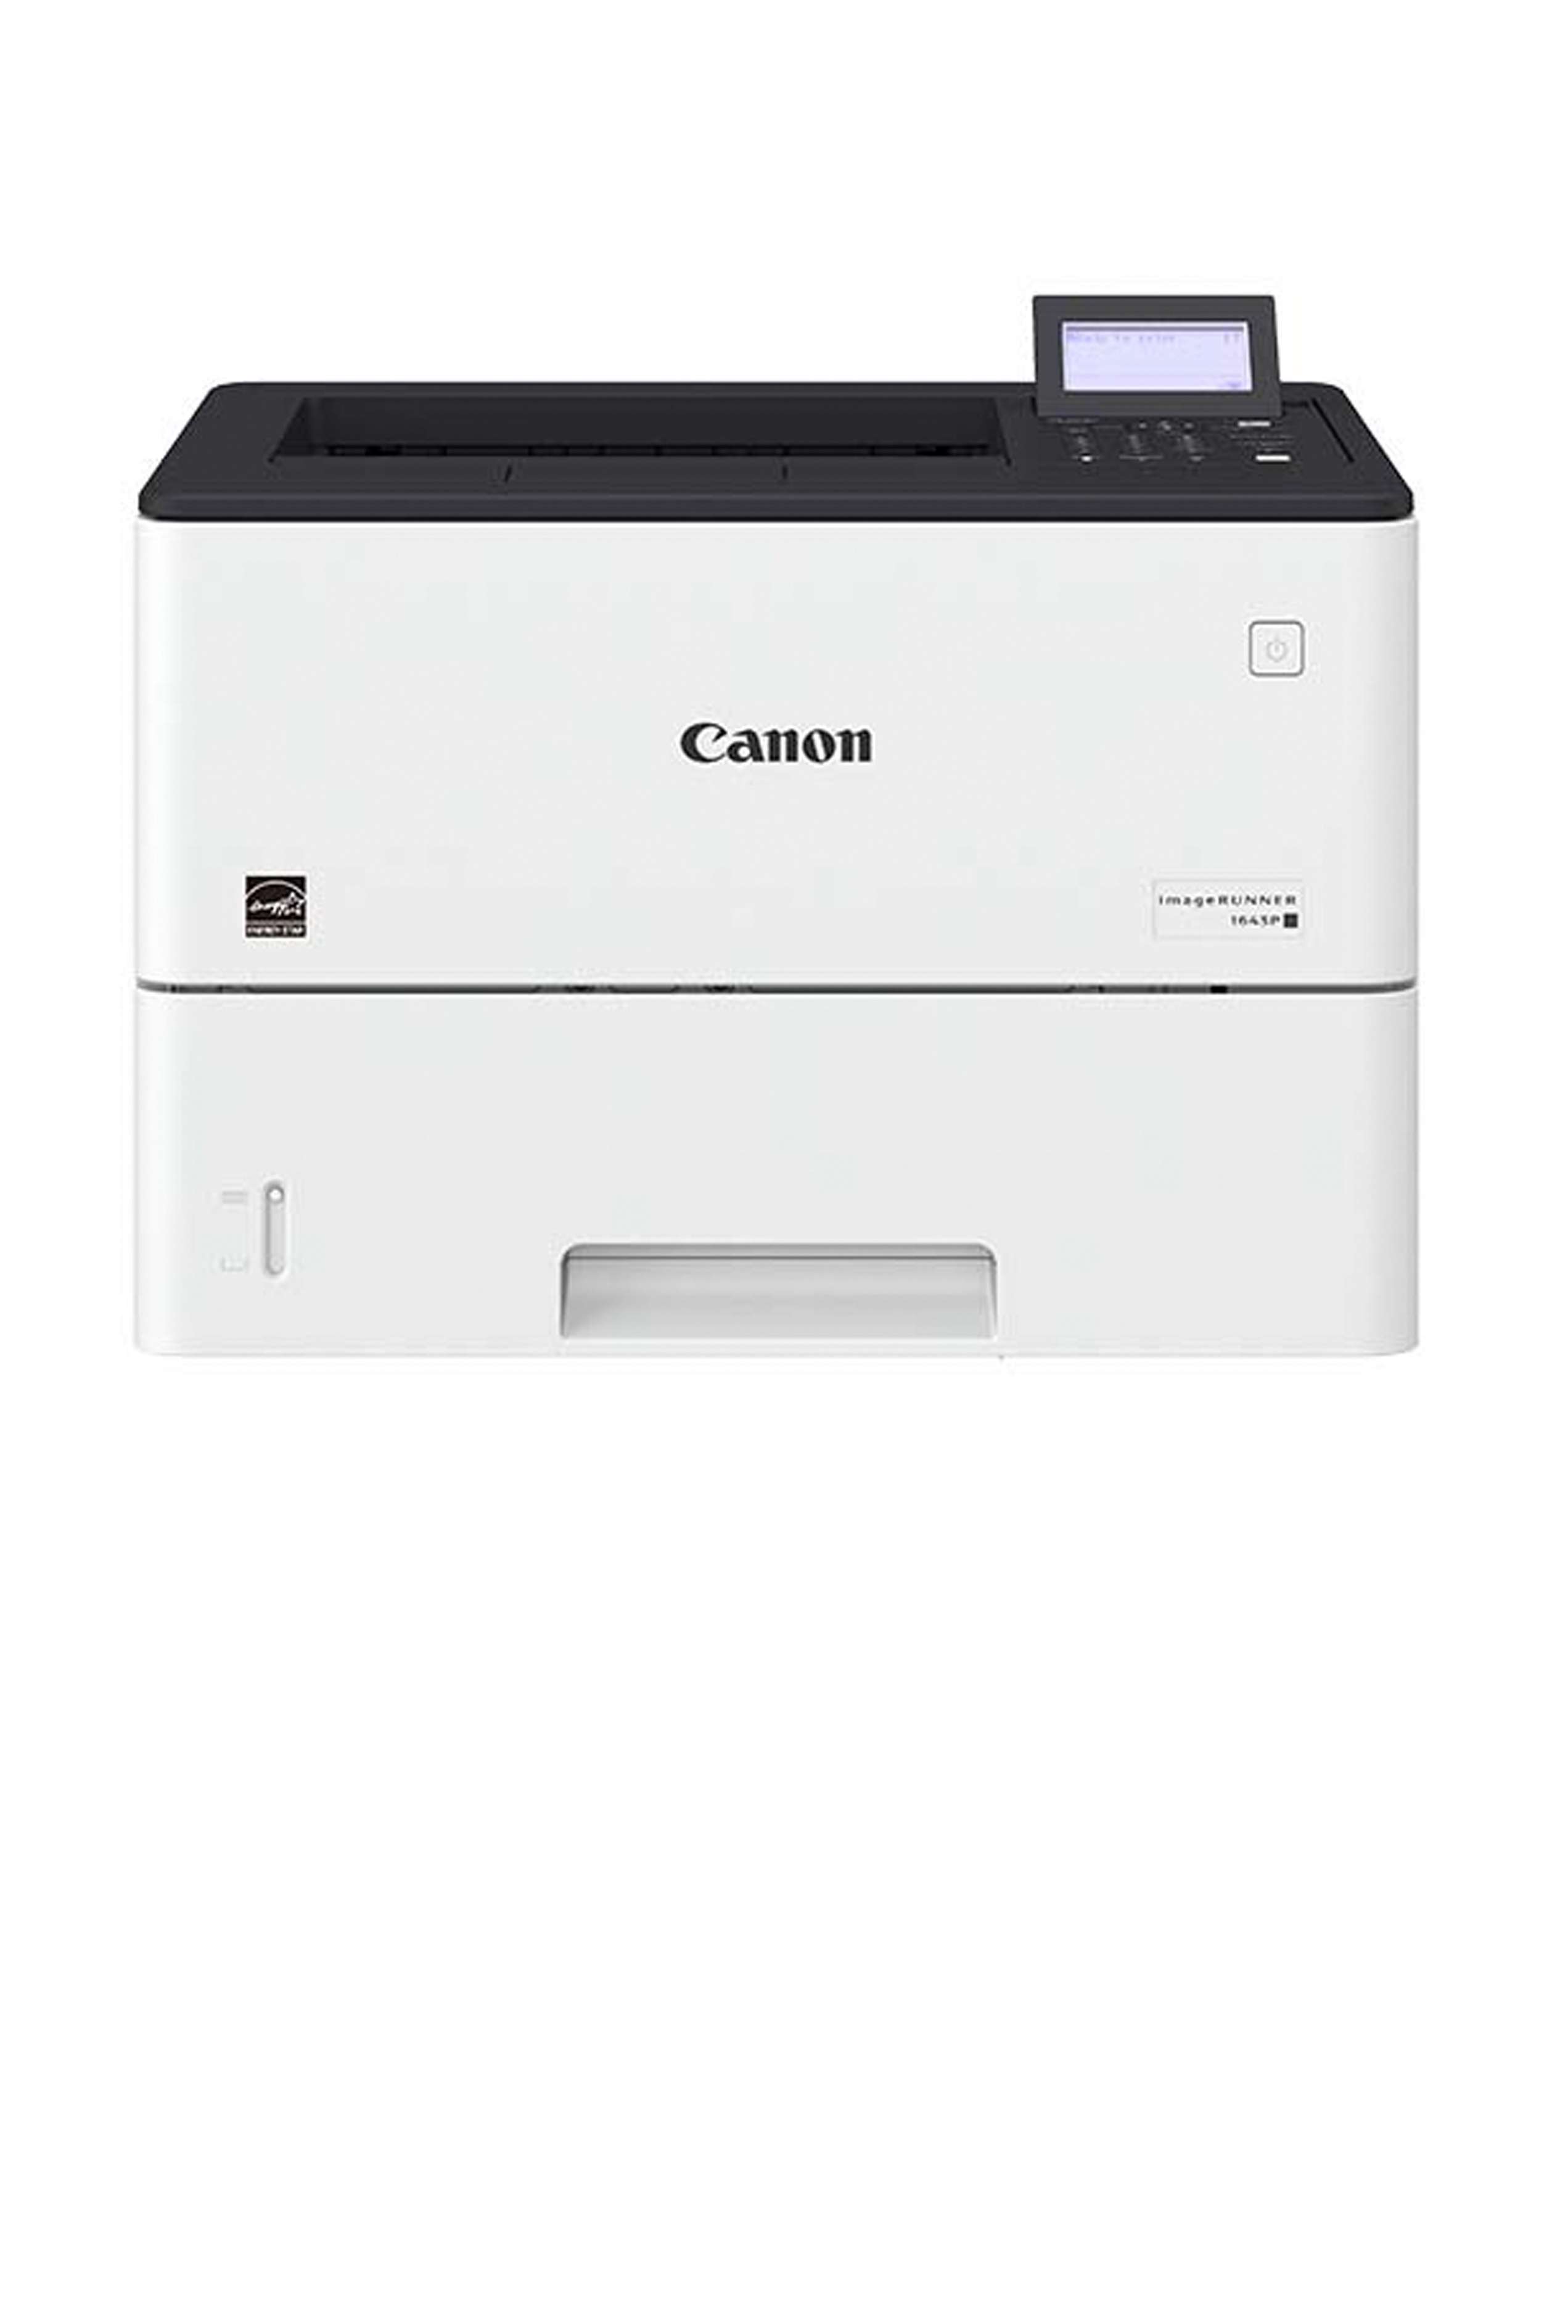 Canon CANON IMAGERUNNER 1643P MFP (45PPM)